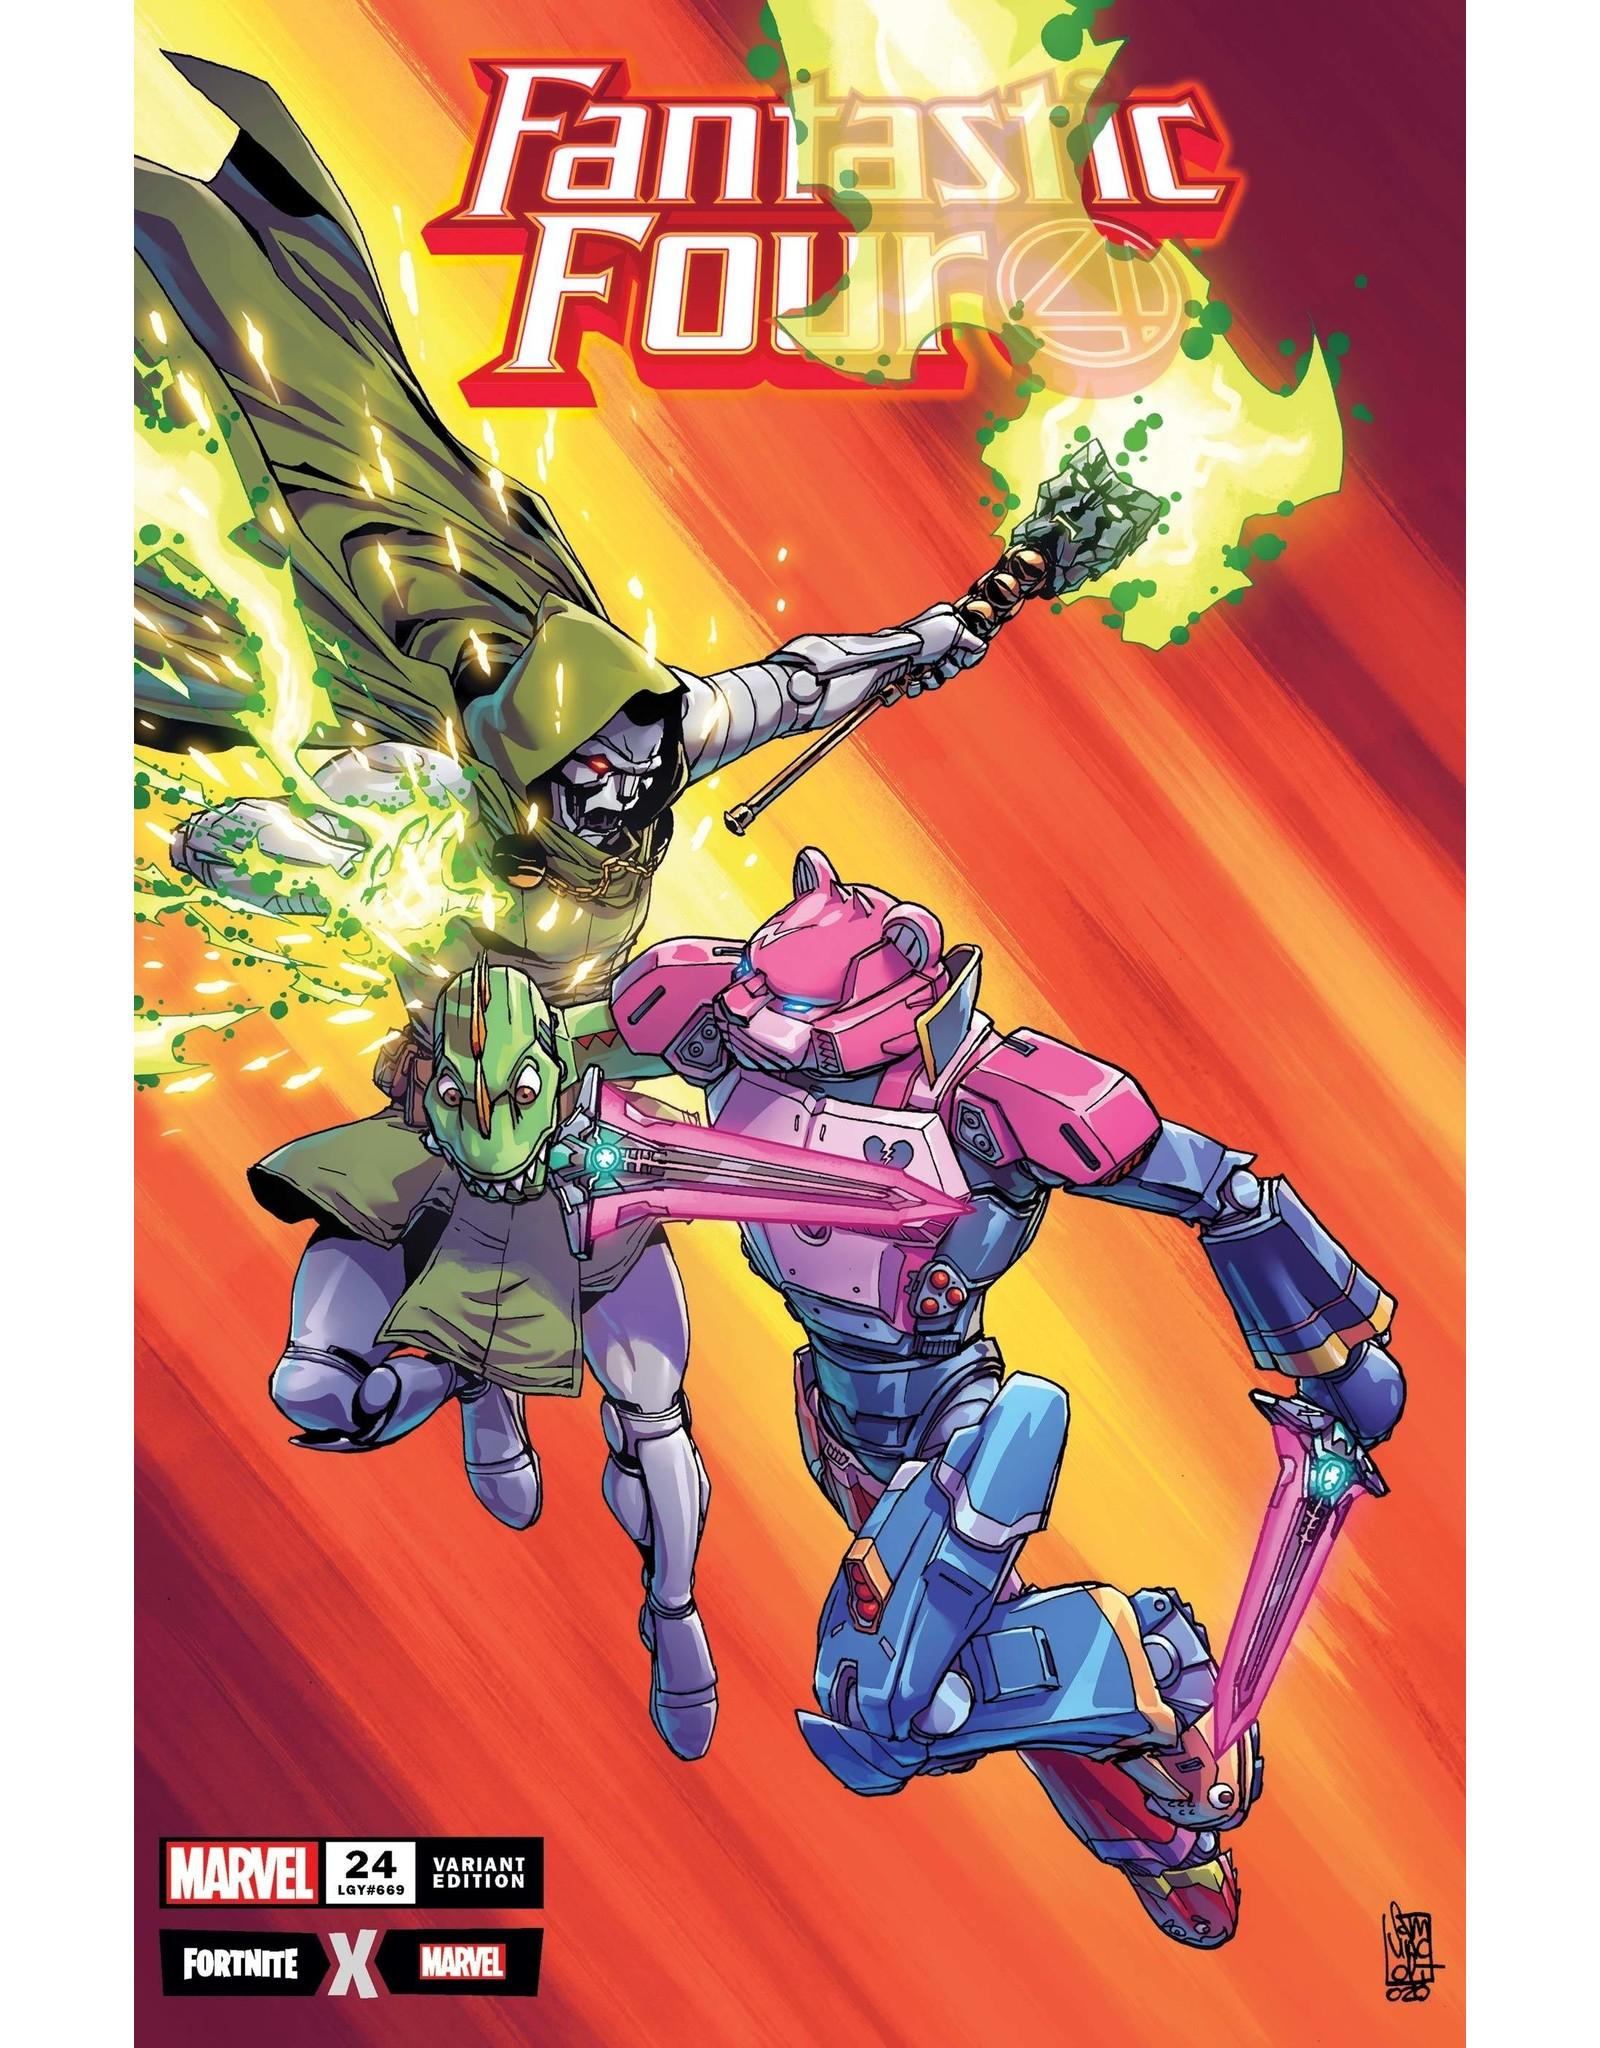 MARVEL COMICS FANTASTIC FOUR #24 CAMUNCOLI FORTNITE VAR